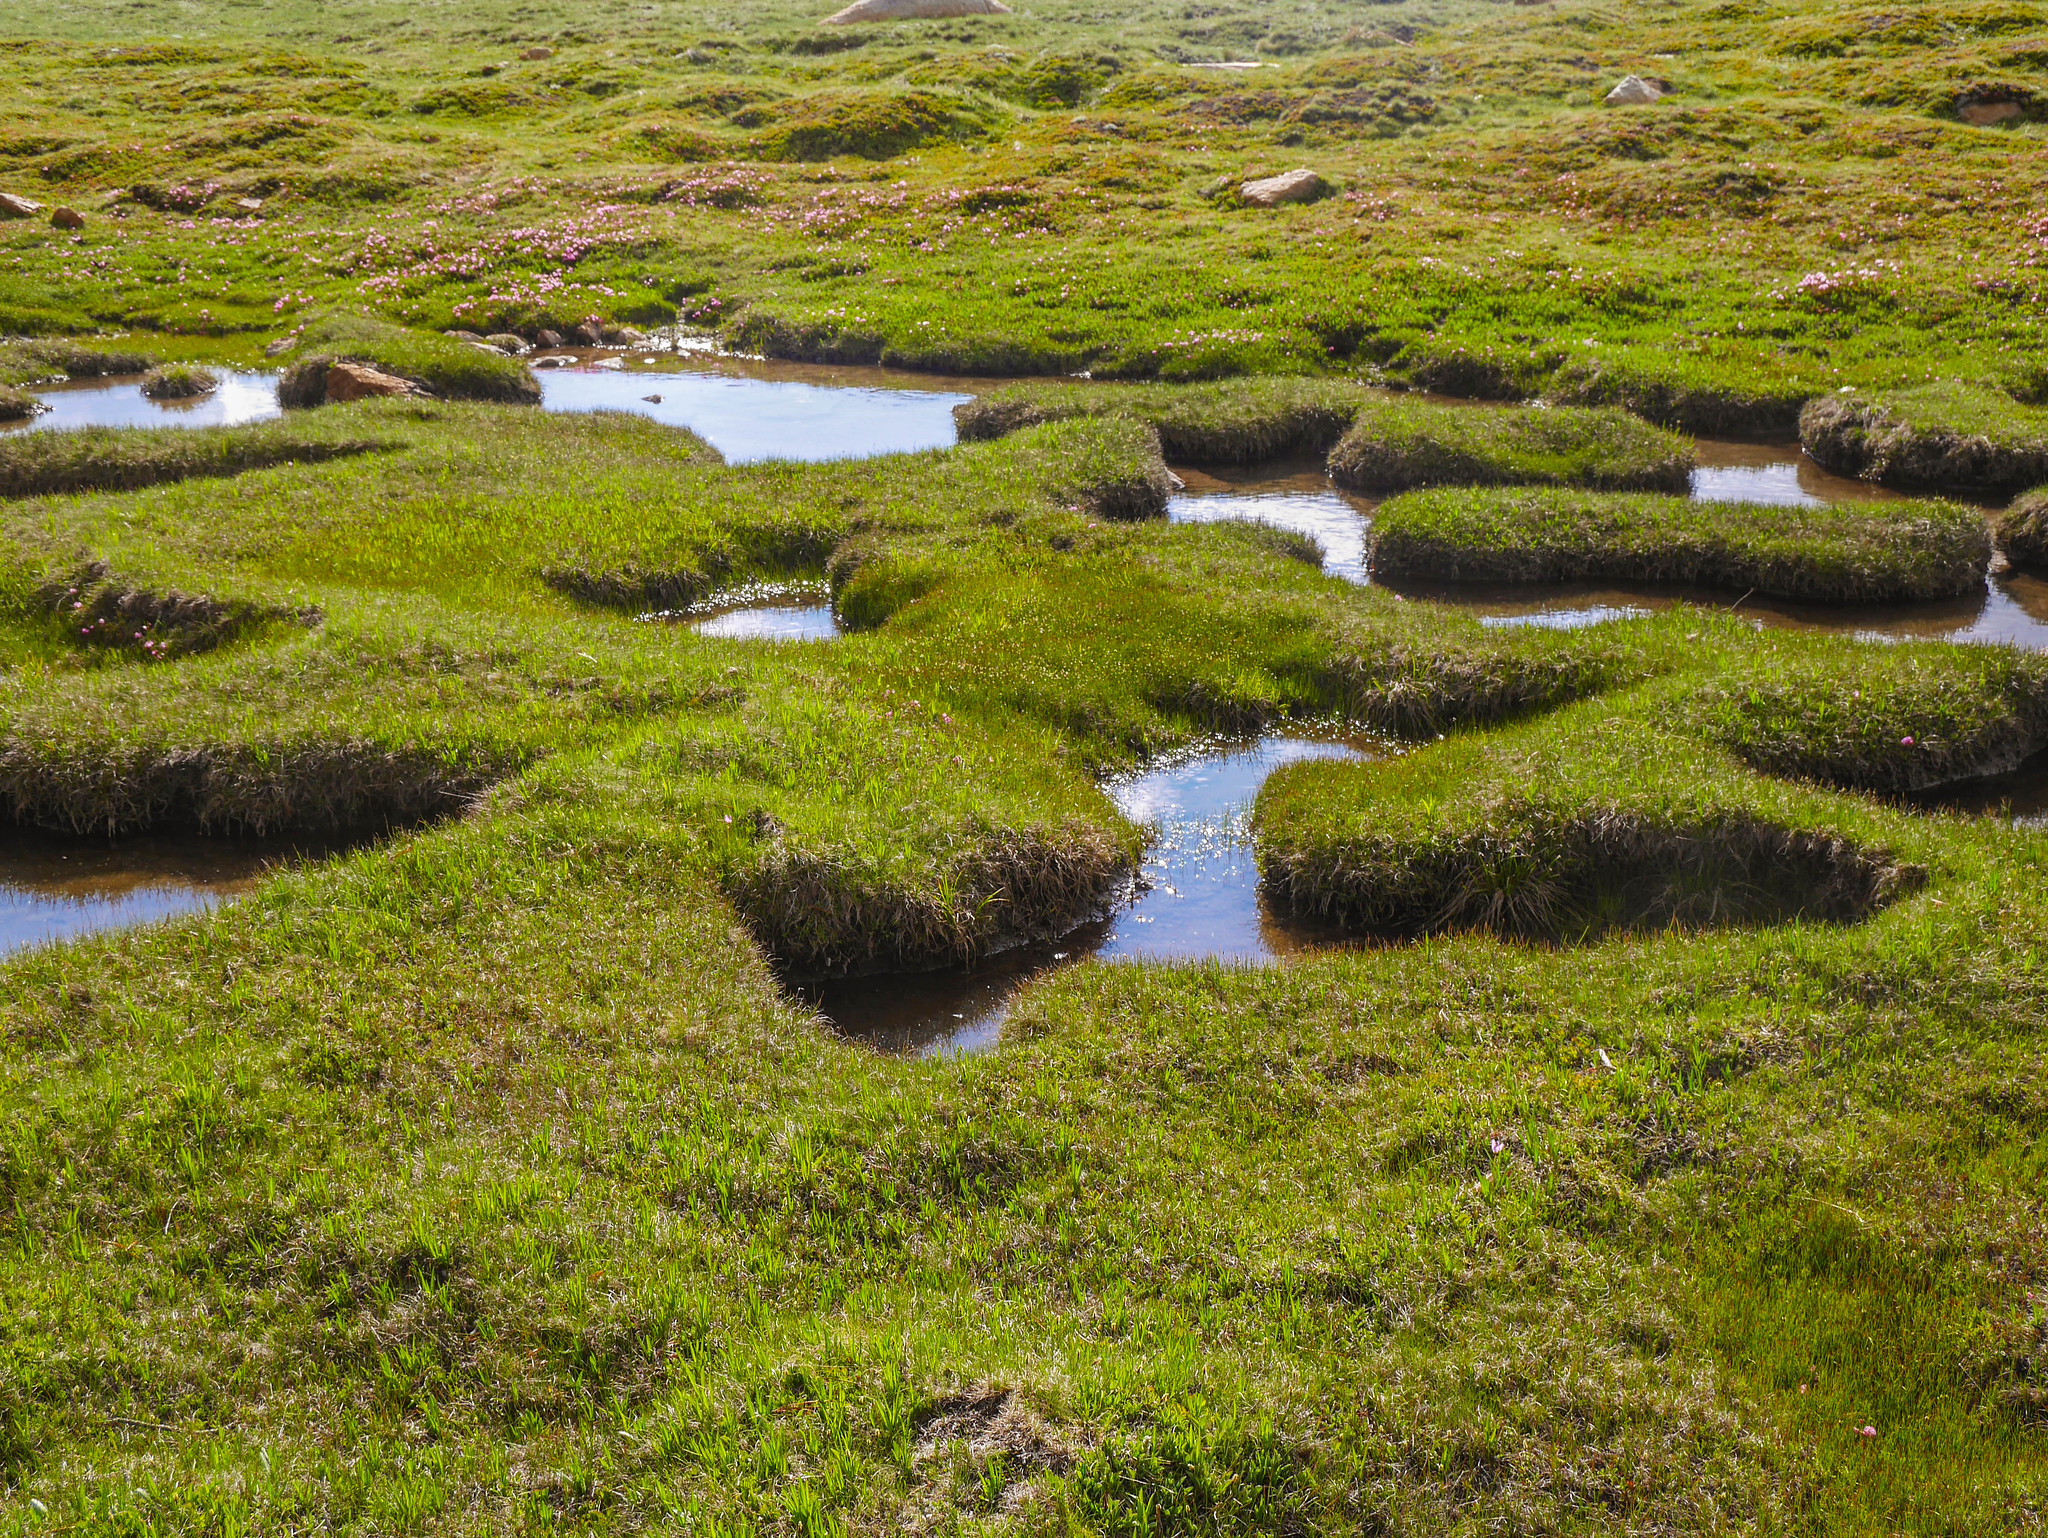 Lush spongy meadows!